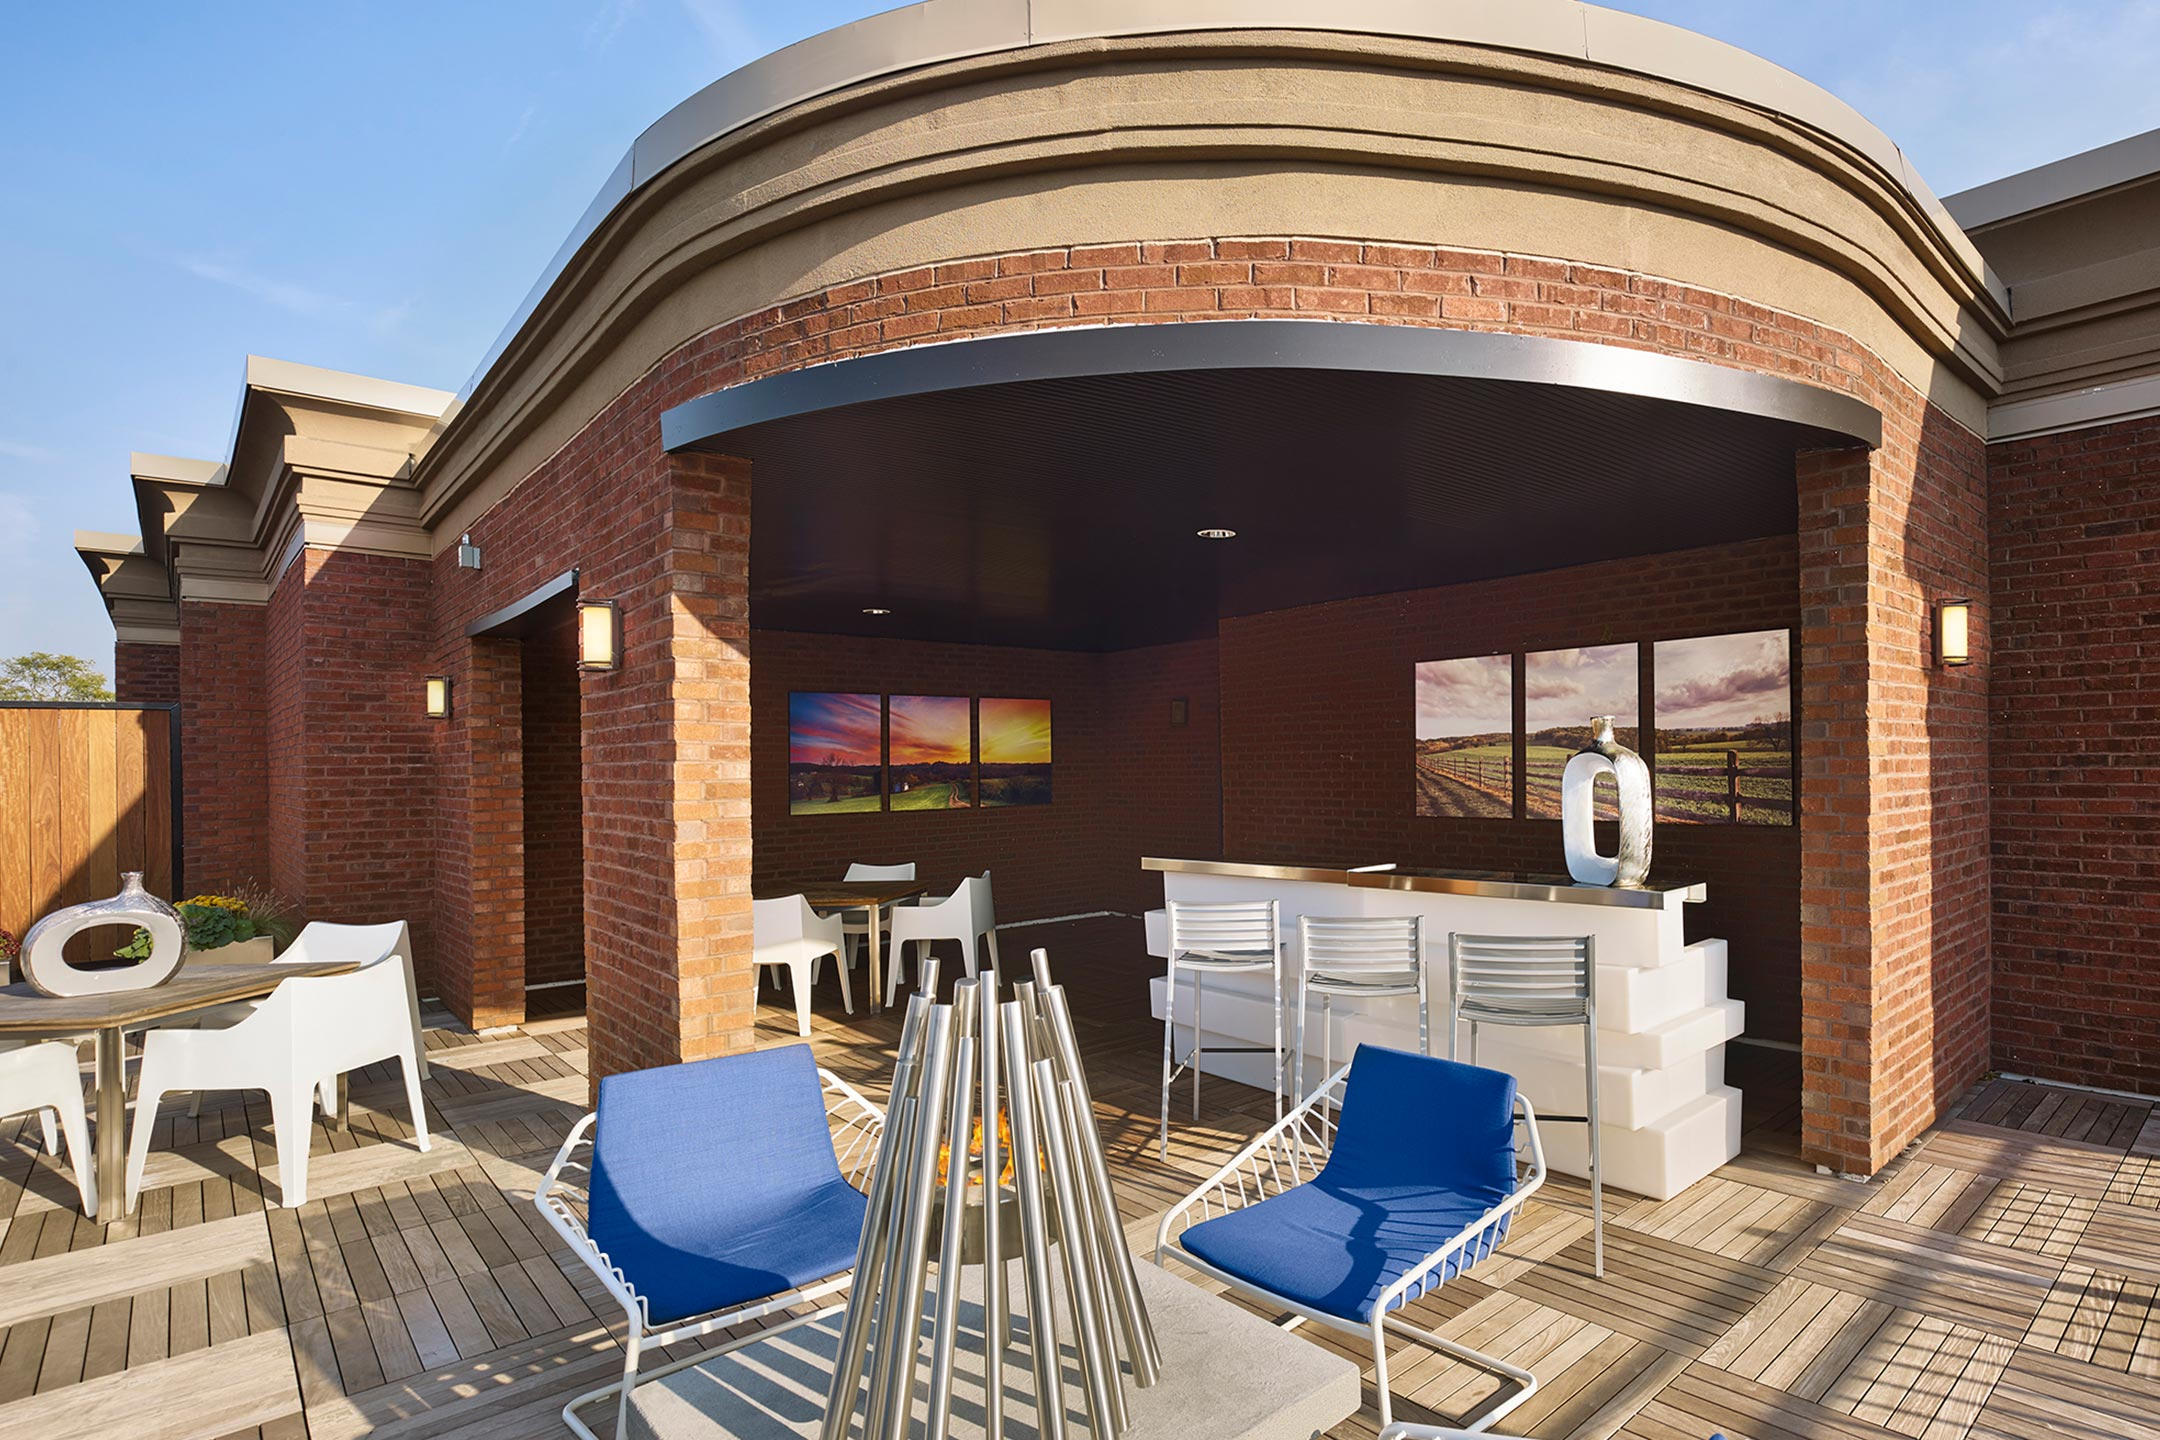 4th floor resident terrace chestnut square for Watch terrace house season 2